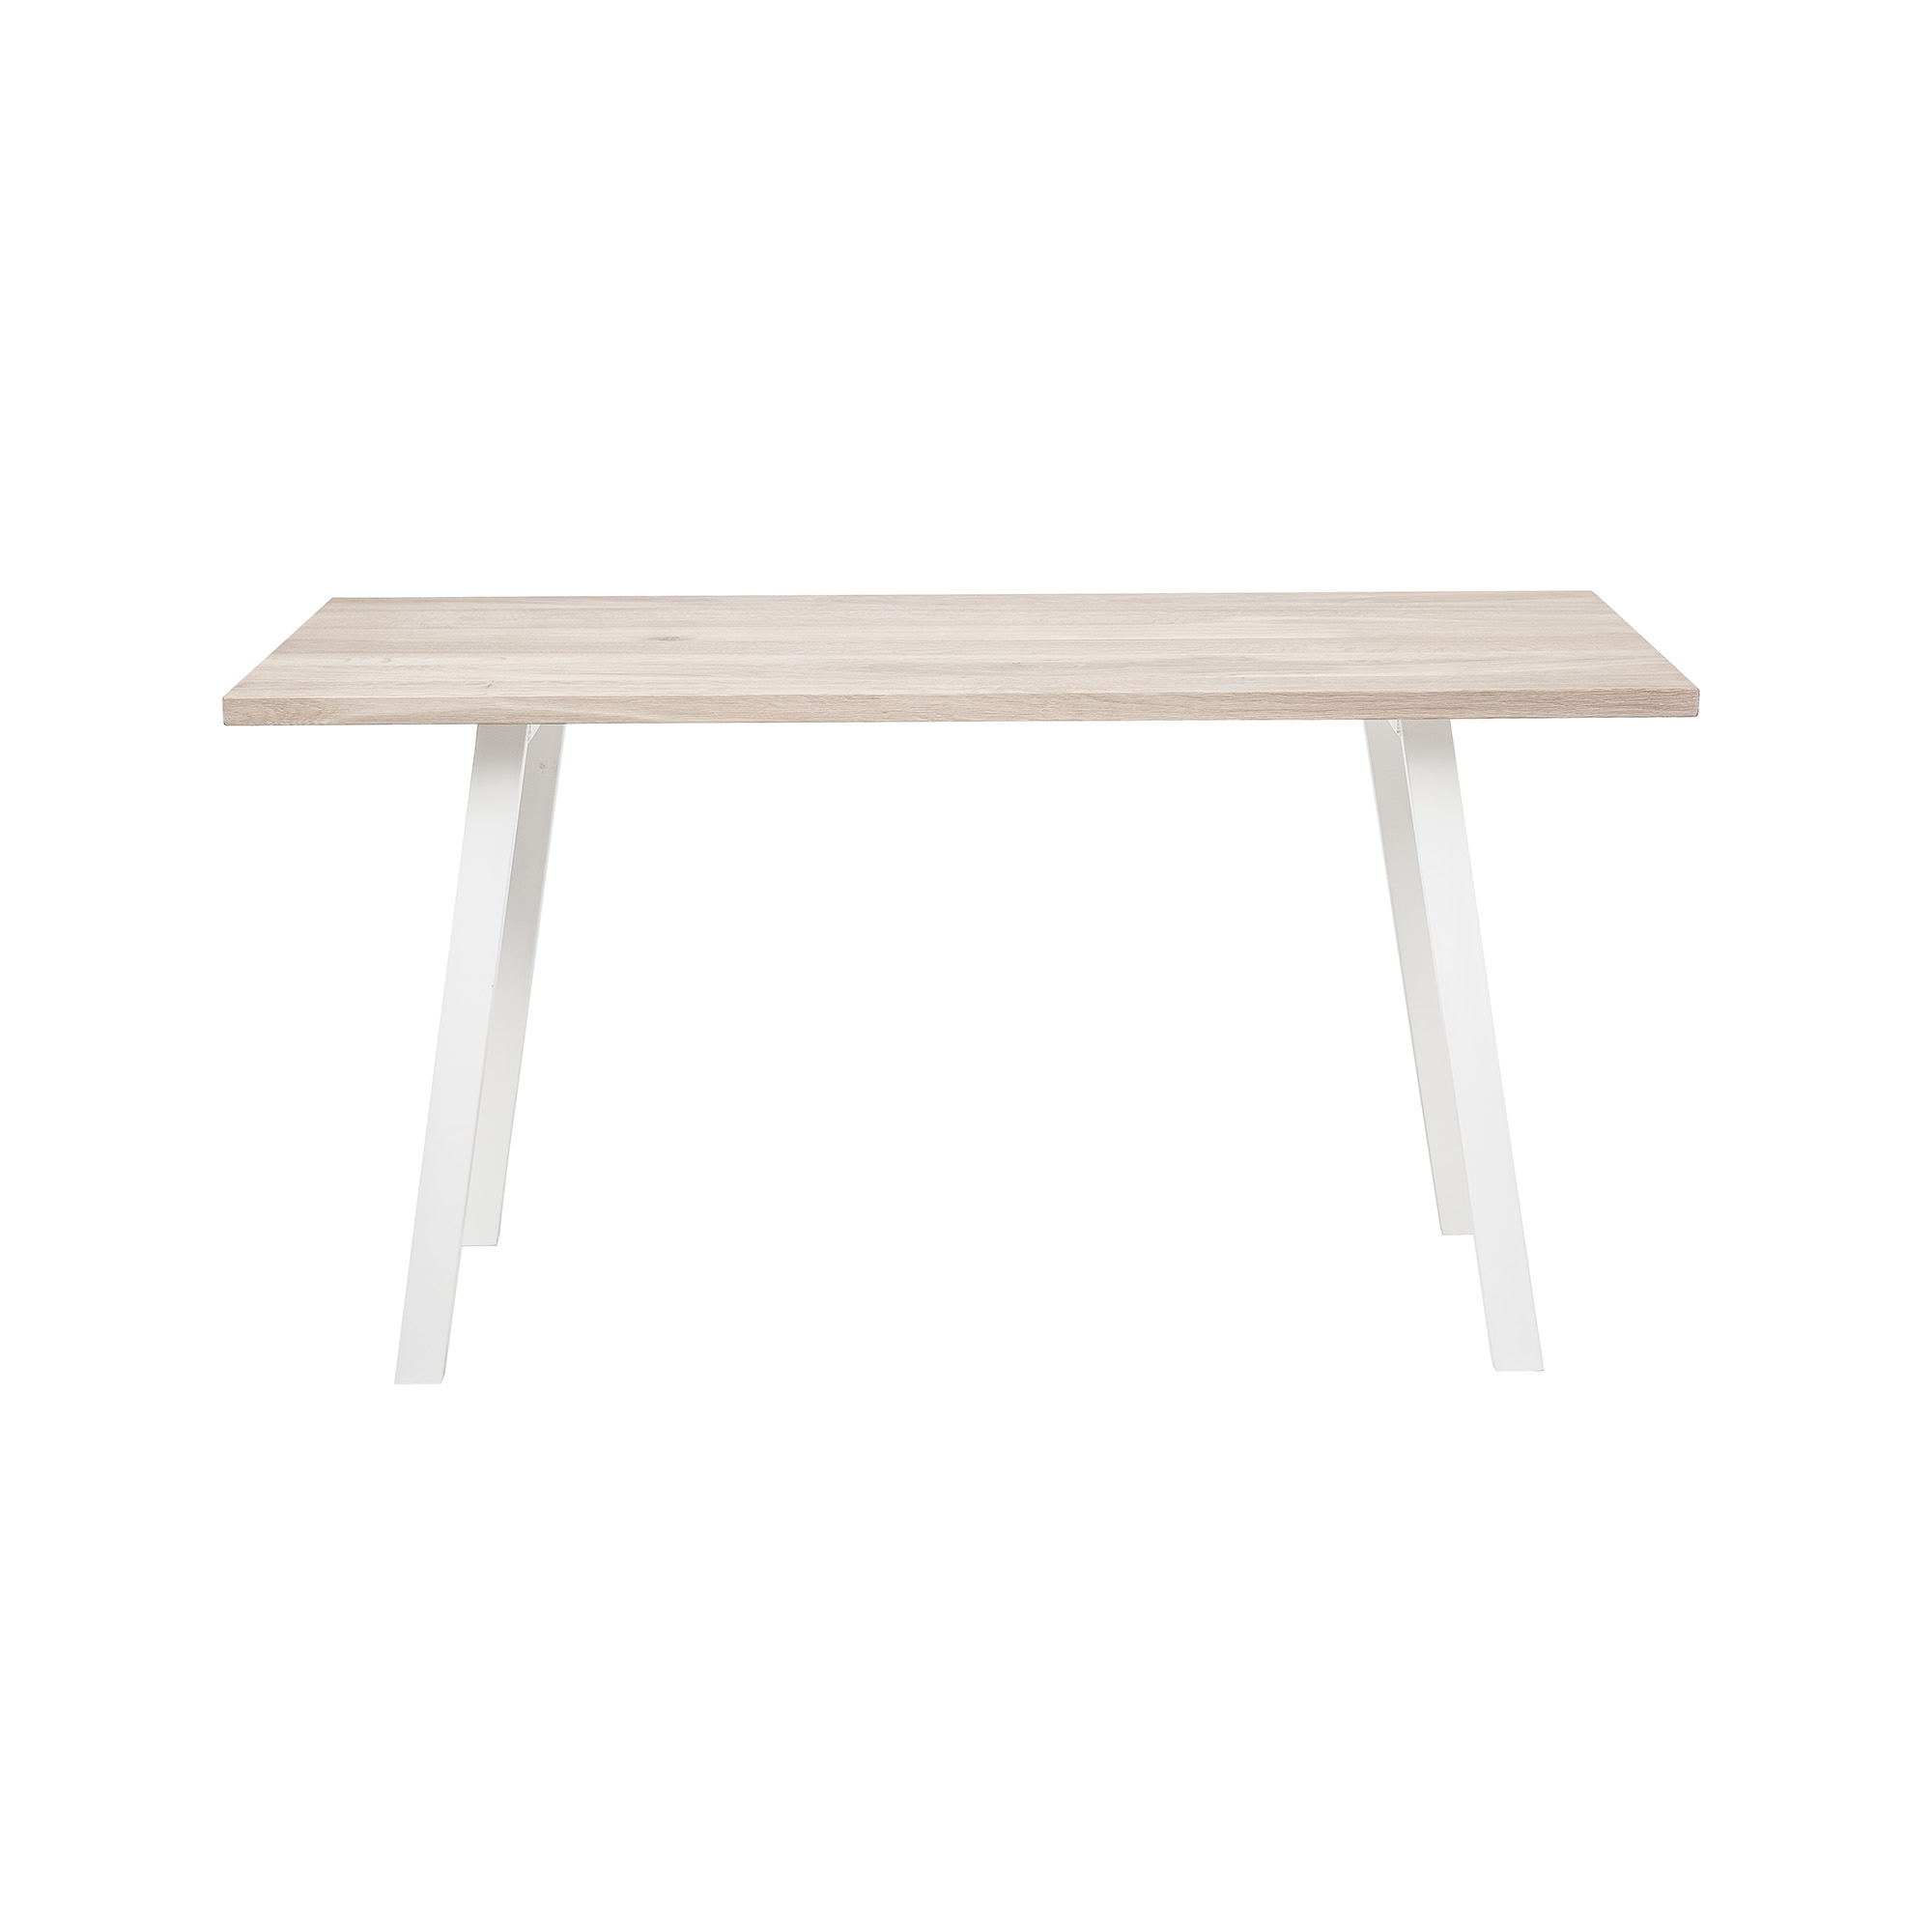 BLOOMINGVILLE Cozy konsolbord - natur egetræ/hvid jern